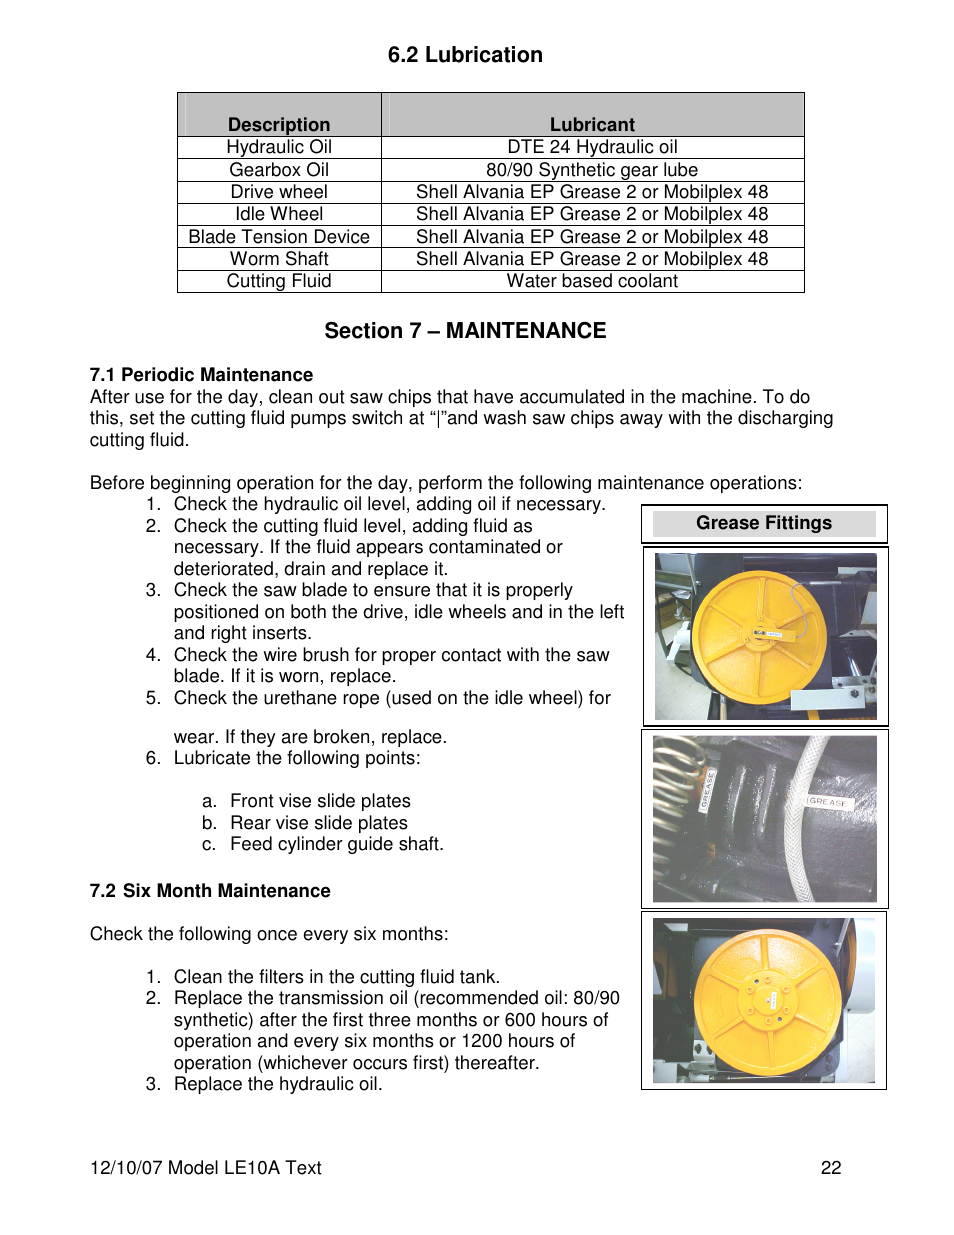 Dake Model LE10A User Manual | Page 22 / 24